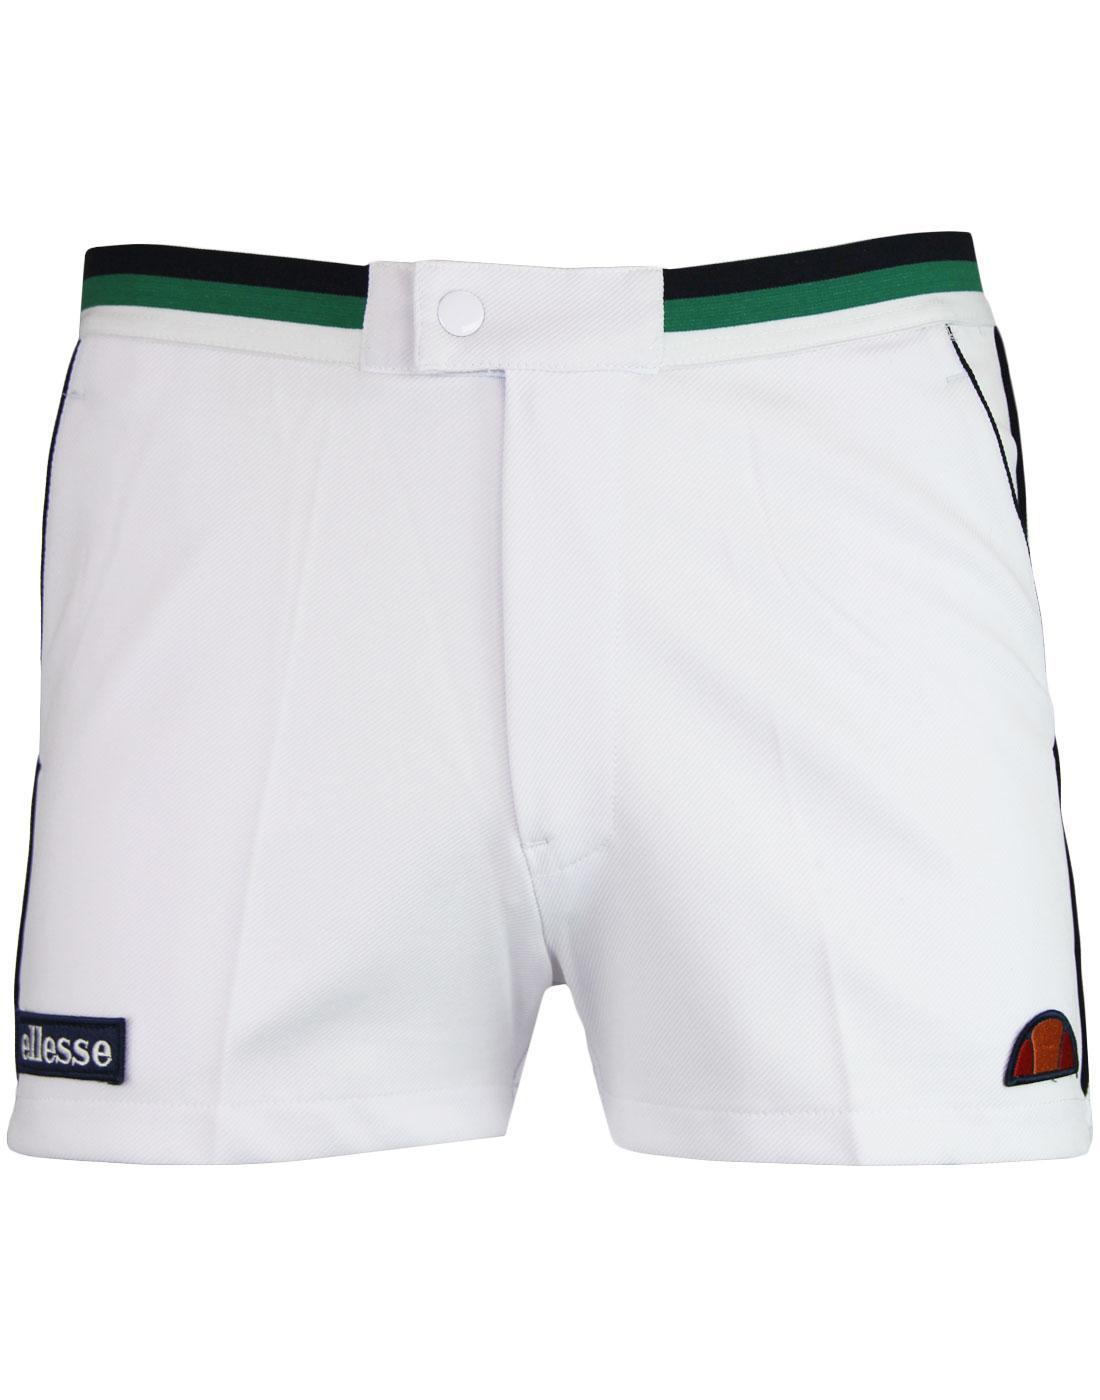 Knapp ELLESSE Men's Retro 70s Tennis Shorts (OW)